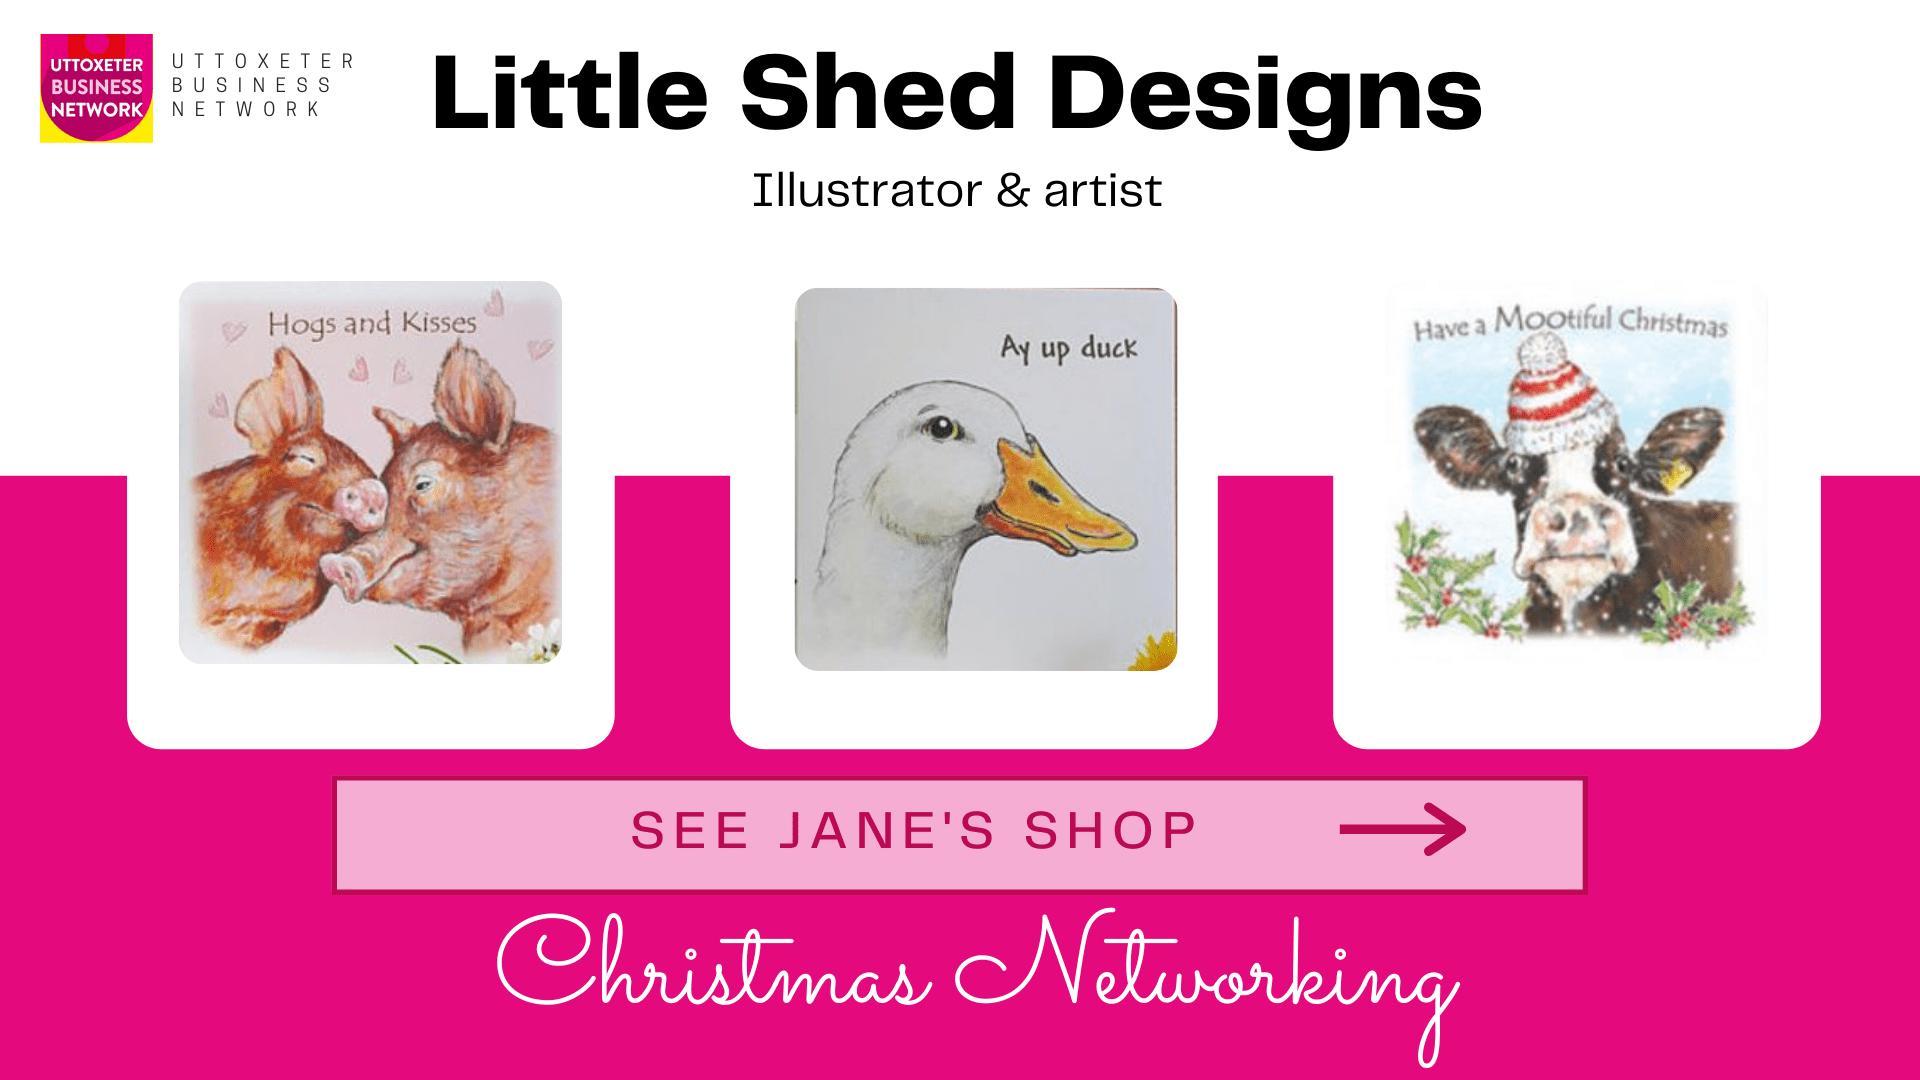 Little Shed Designs